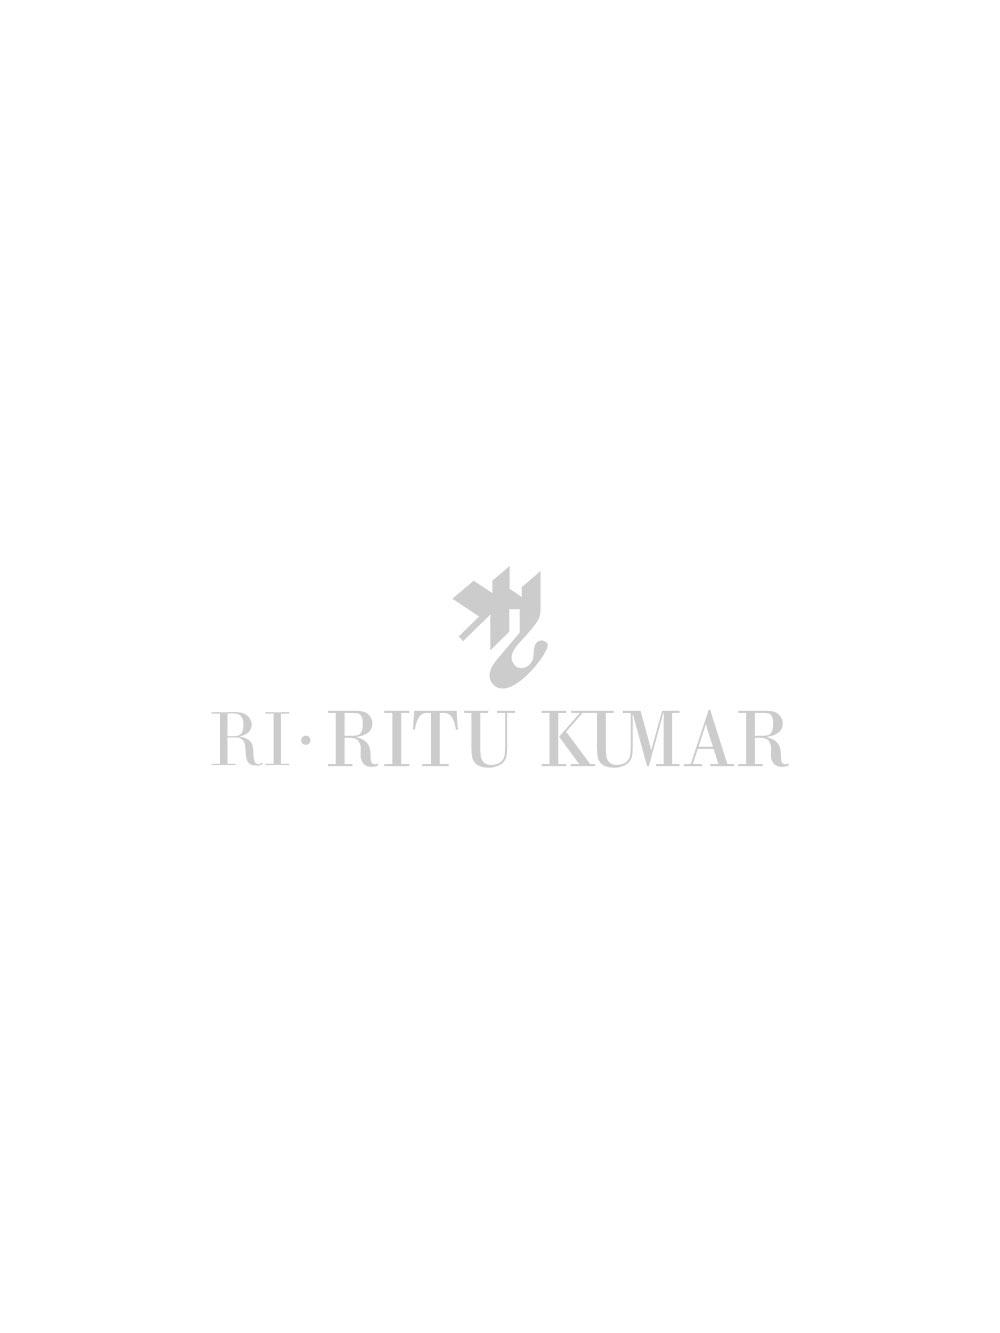 Rose Gold Ari Embroidered Silk Saree by Ritu Kumar